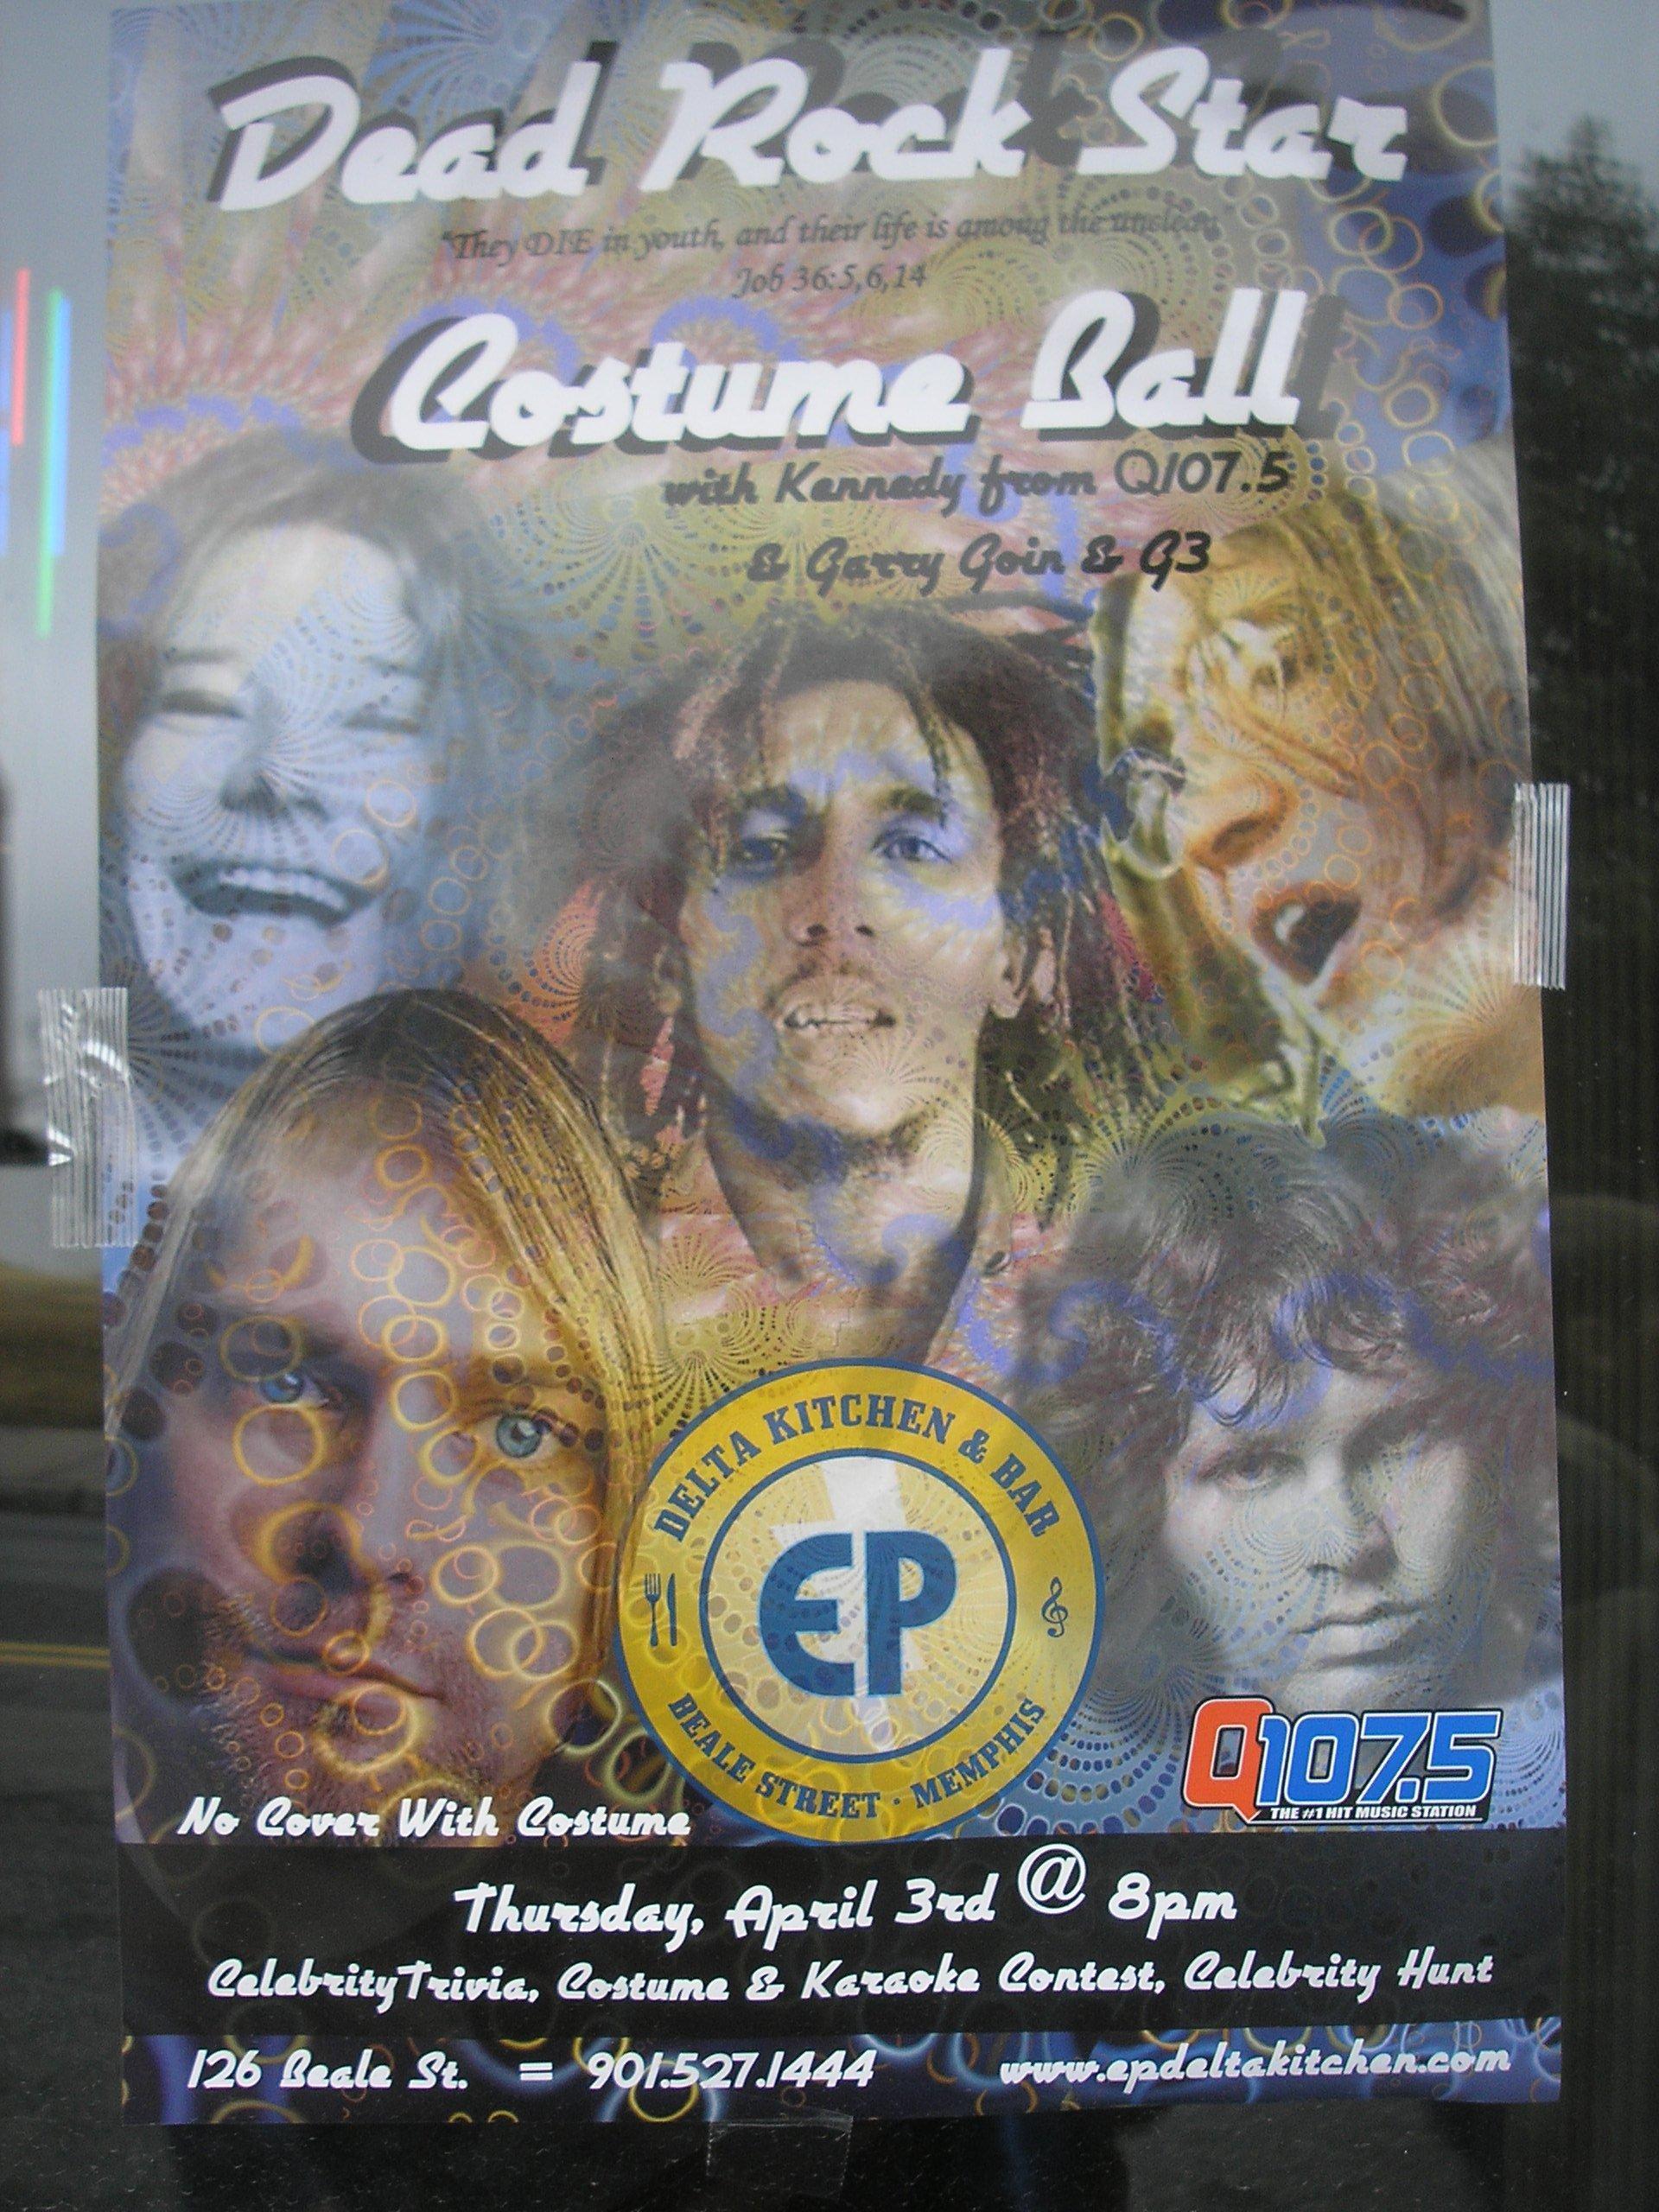 Party like a (dead) rock star – Paul Ryburn's Journal